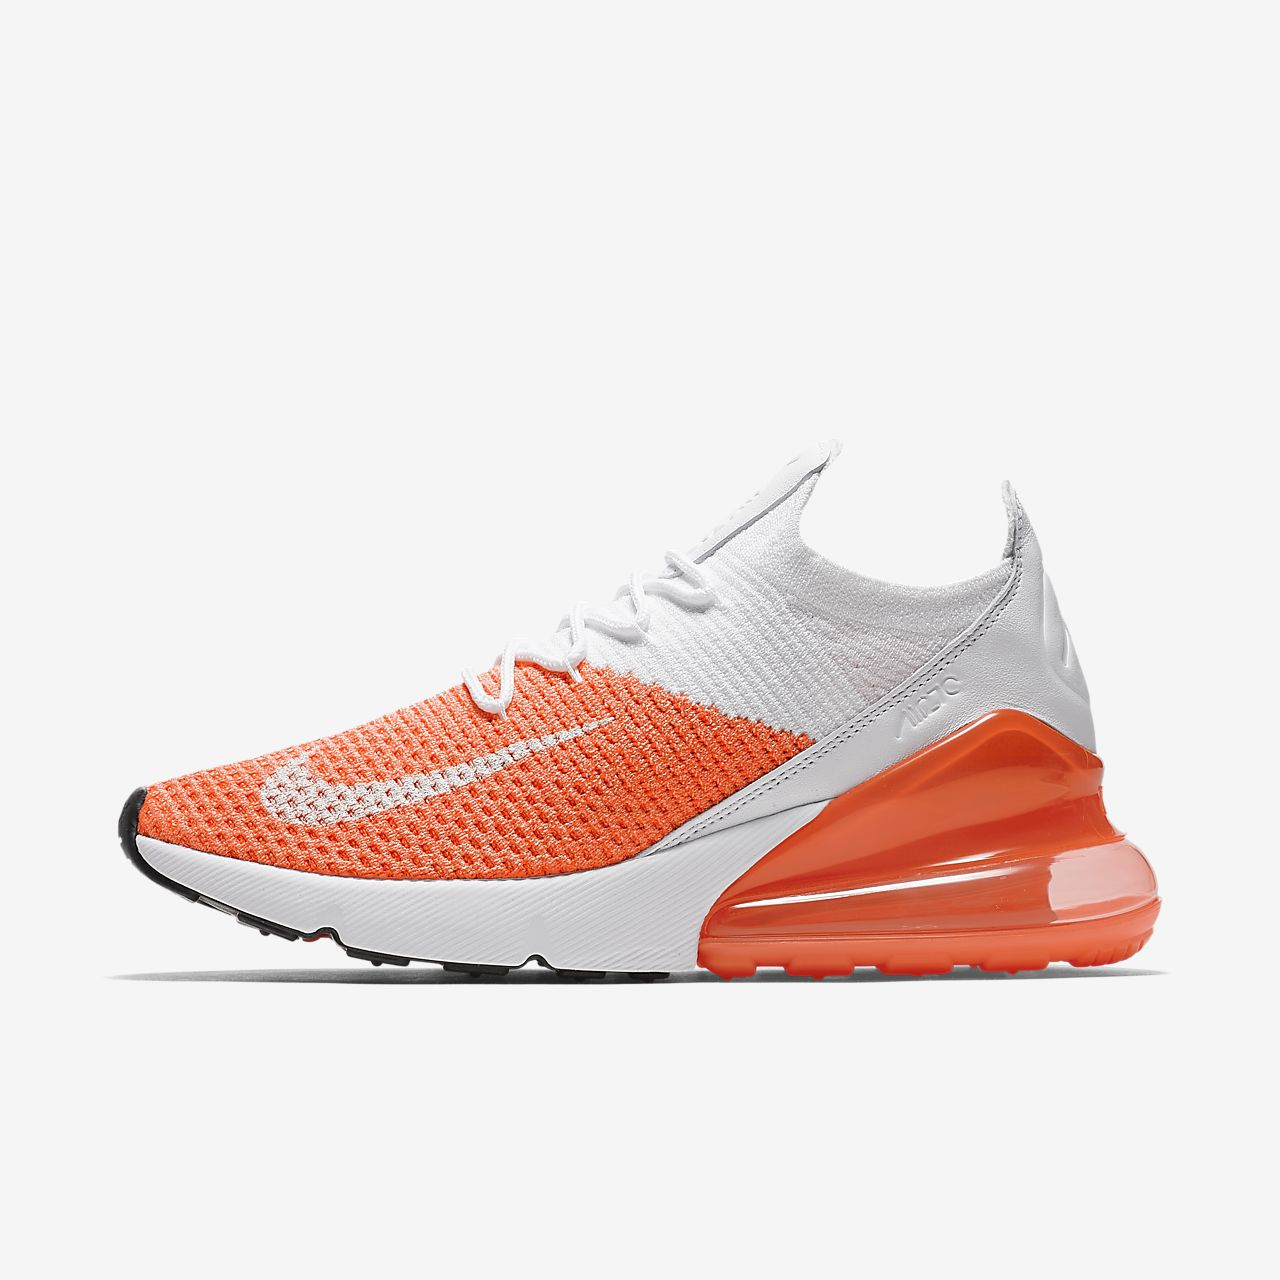 detailed look 977bf 65262 Schuhe Sandalen   Sandaletten Damen 66,50 € Nike Air Max 270 Flyknit  Damenschuh Perlato DIANA Grau - Kostenloser Versand bei Spartoode ! - Schuhe  Low ...